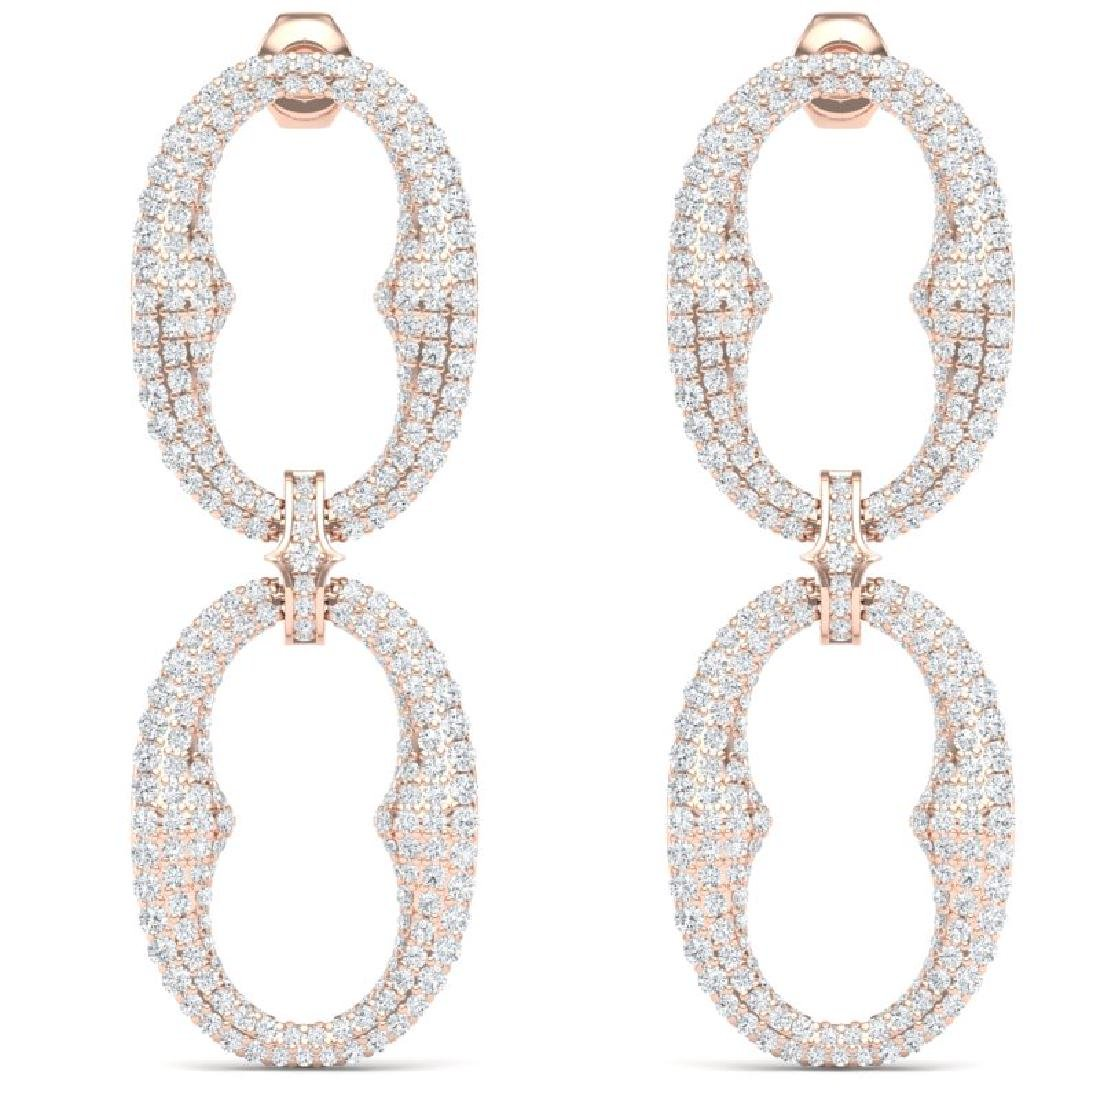 7 CTW Certified VS/SI Diamond Earrings 18K Rose Gold - 3